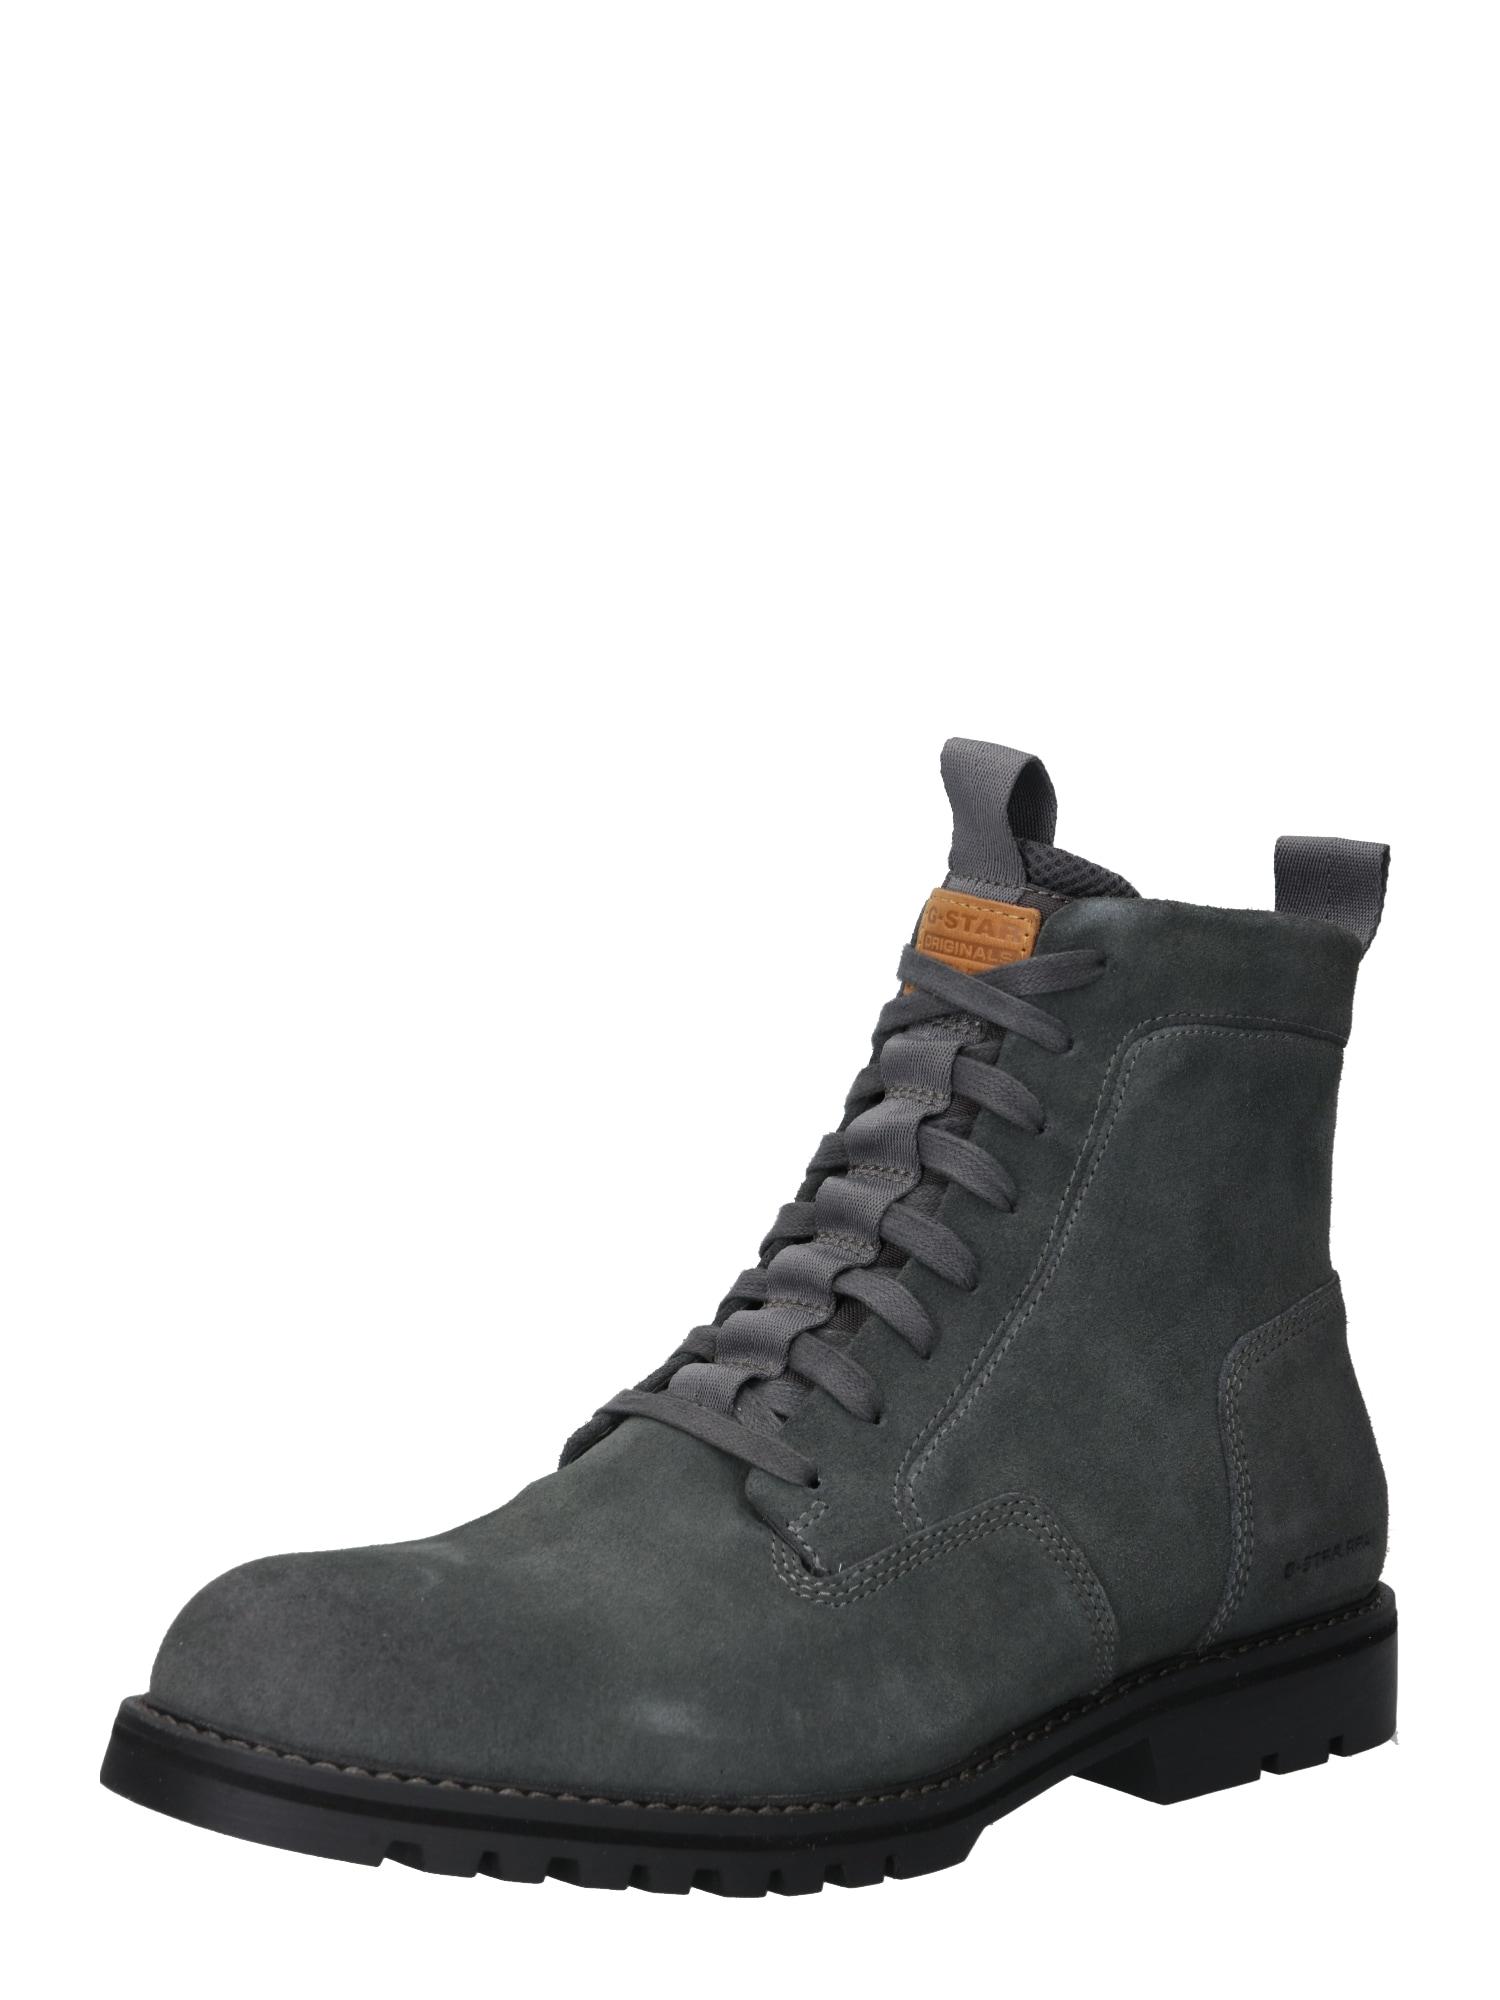 Šněrovací boty Landoh šedá G-STAR RAW